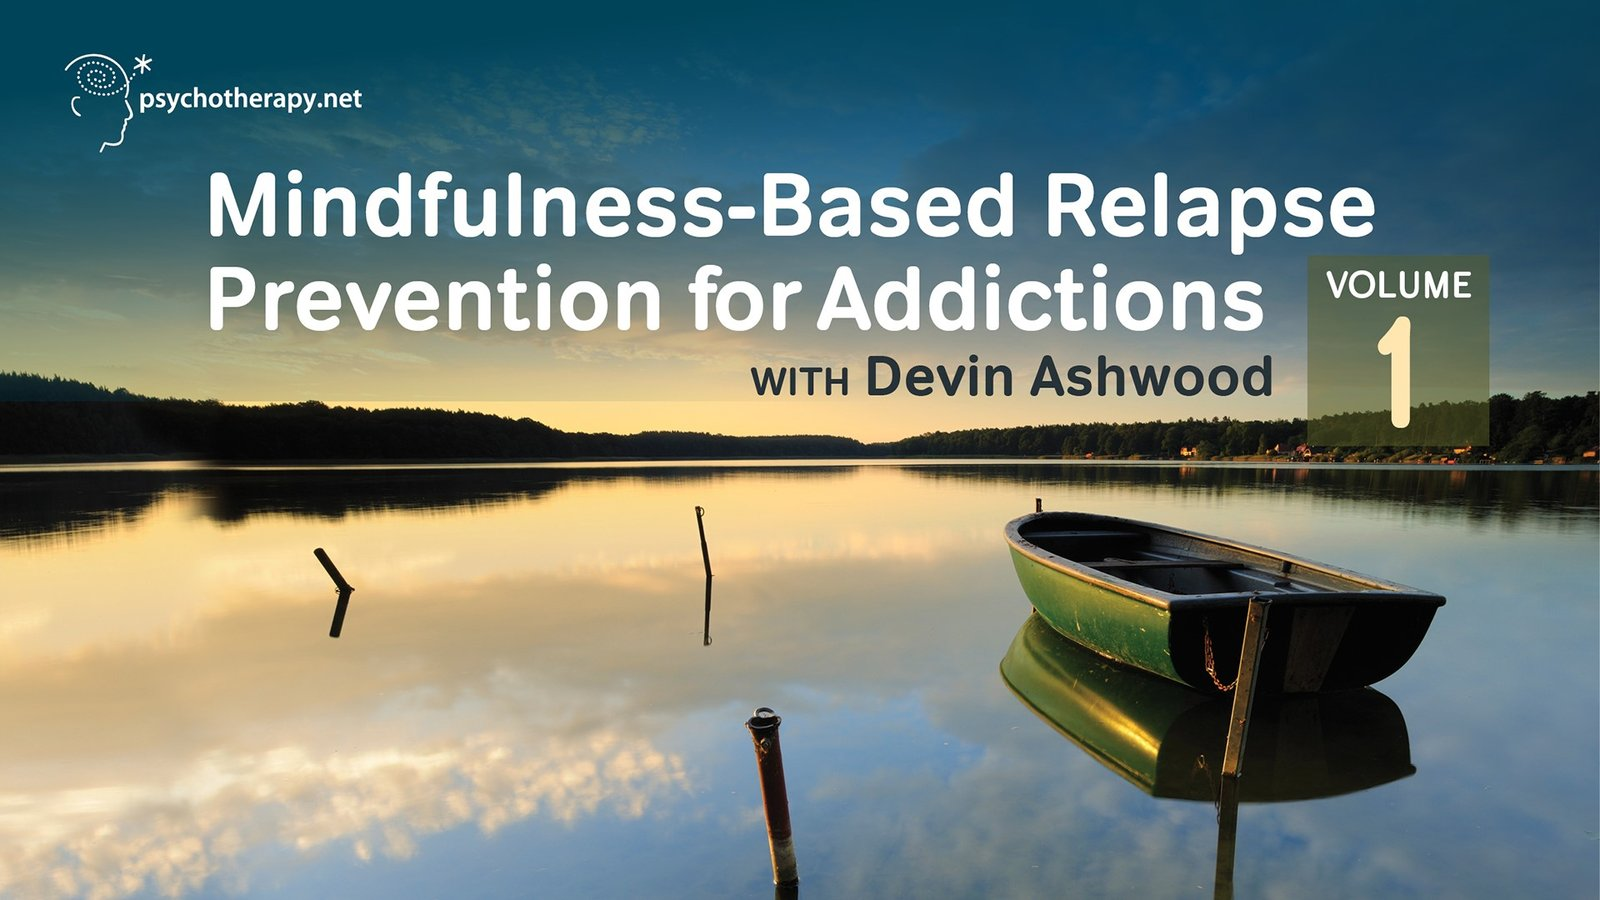 Mindfulness-Based Relapse Prevention for Addictions Volume I